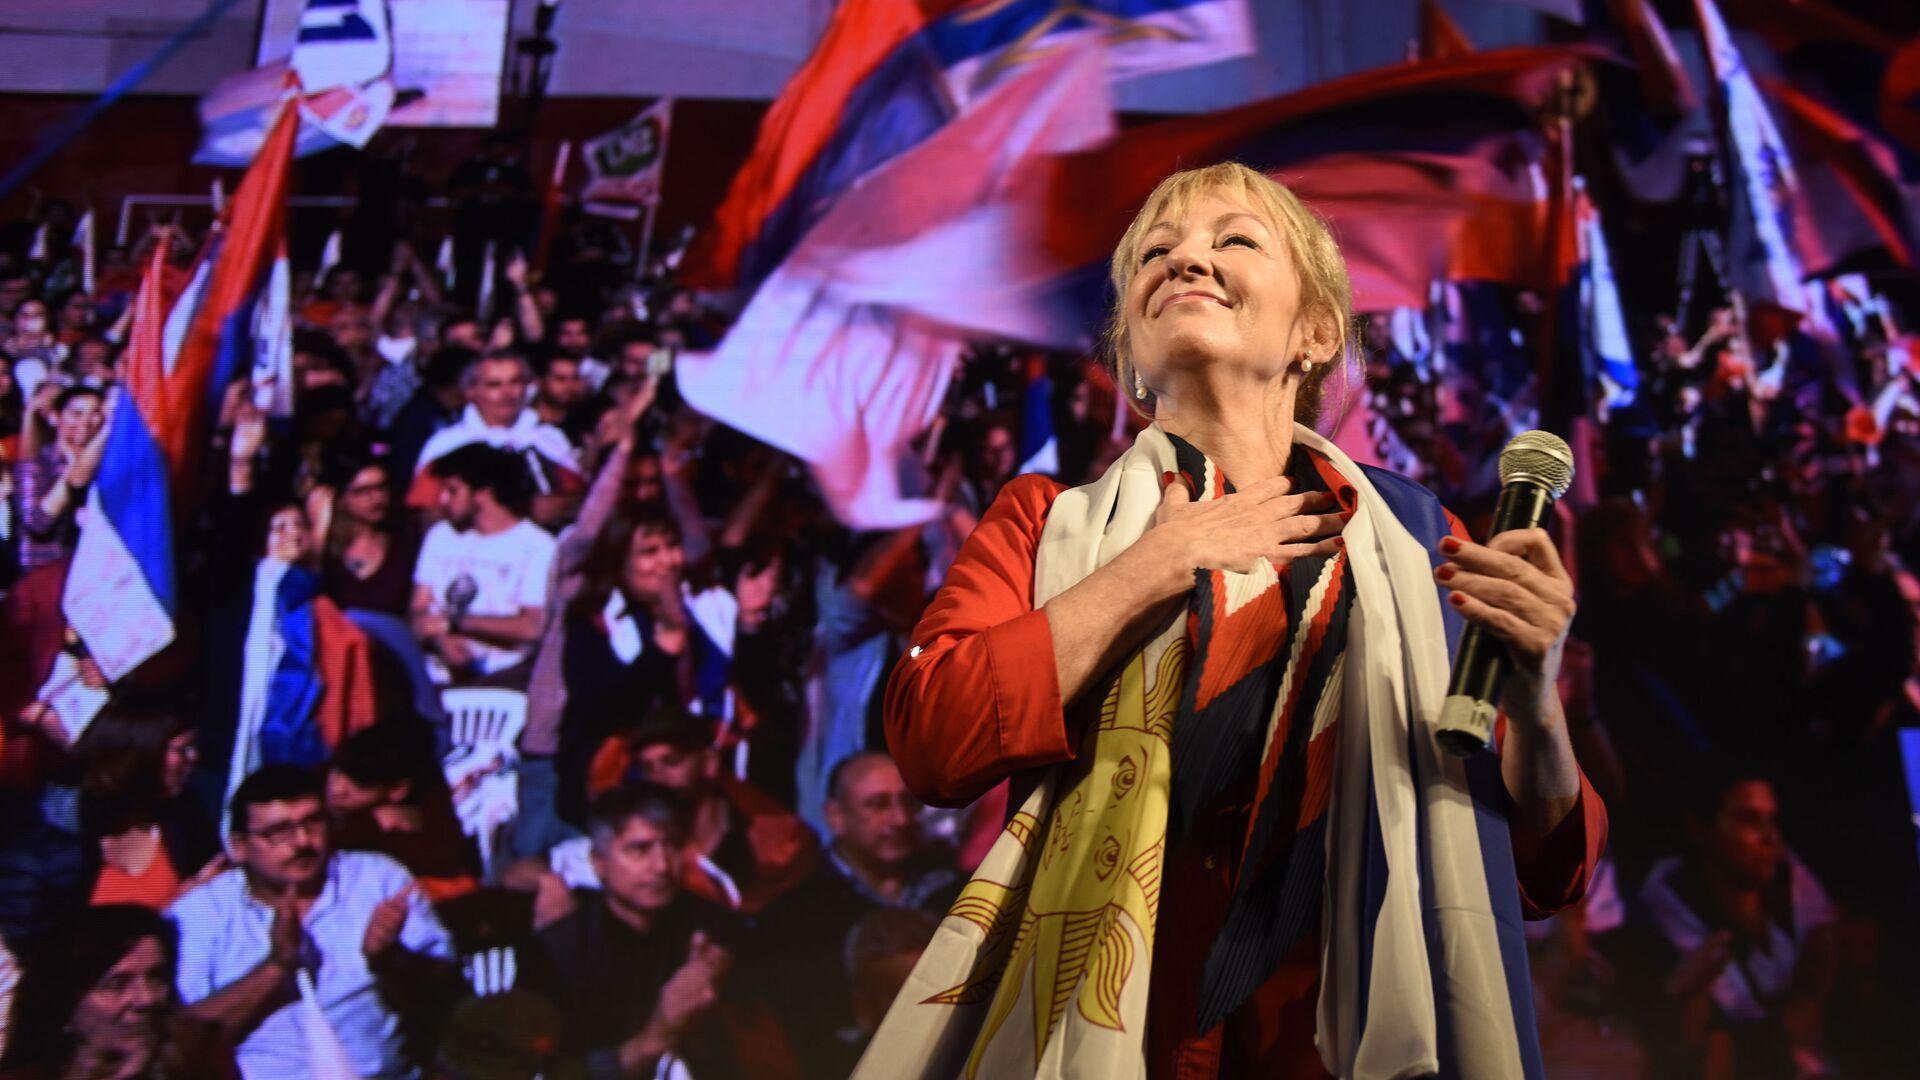 Carolina Cosse durante un acto del Frente Amplio - Sputnik Mundo, 1920, 30.06.2021